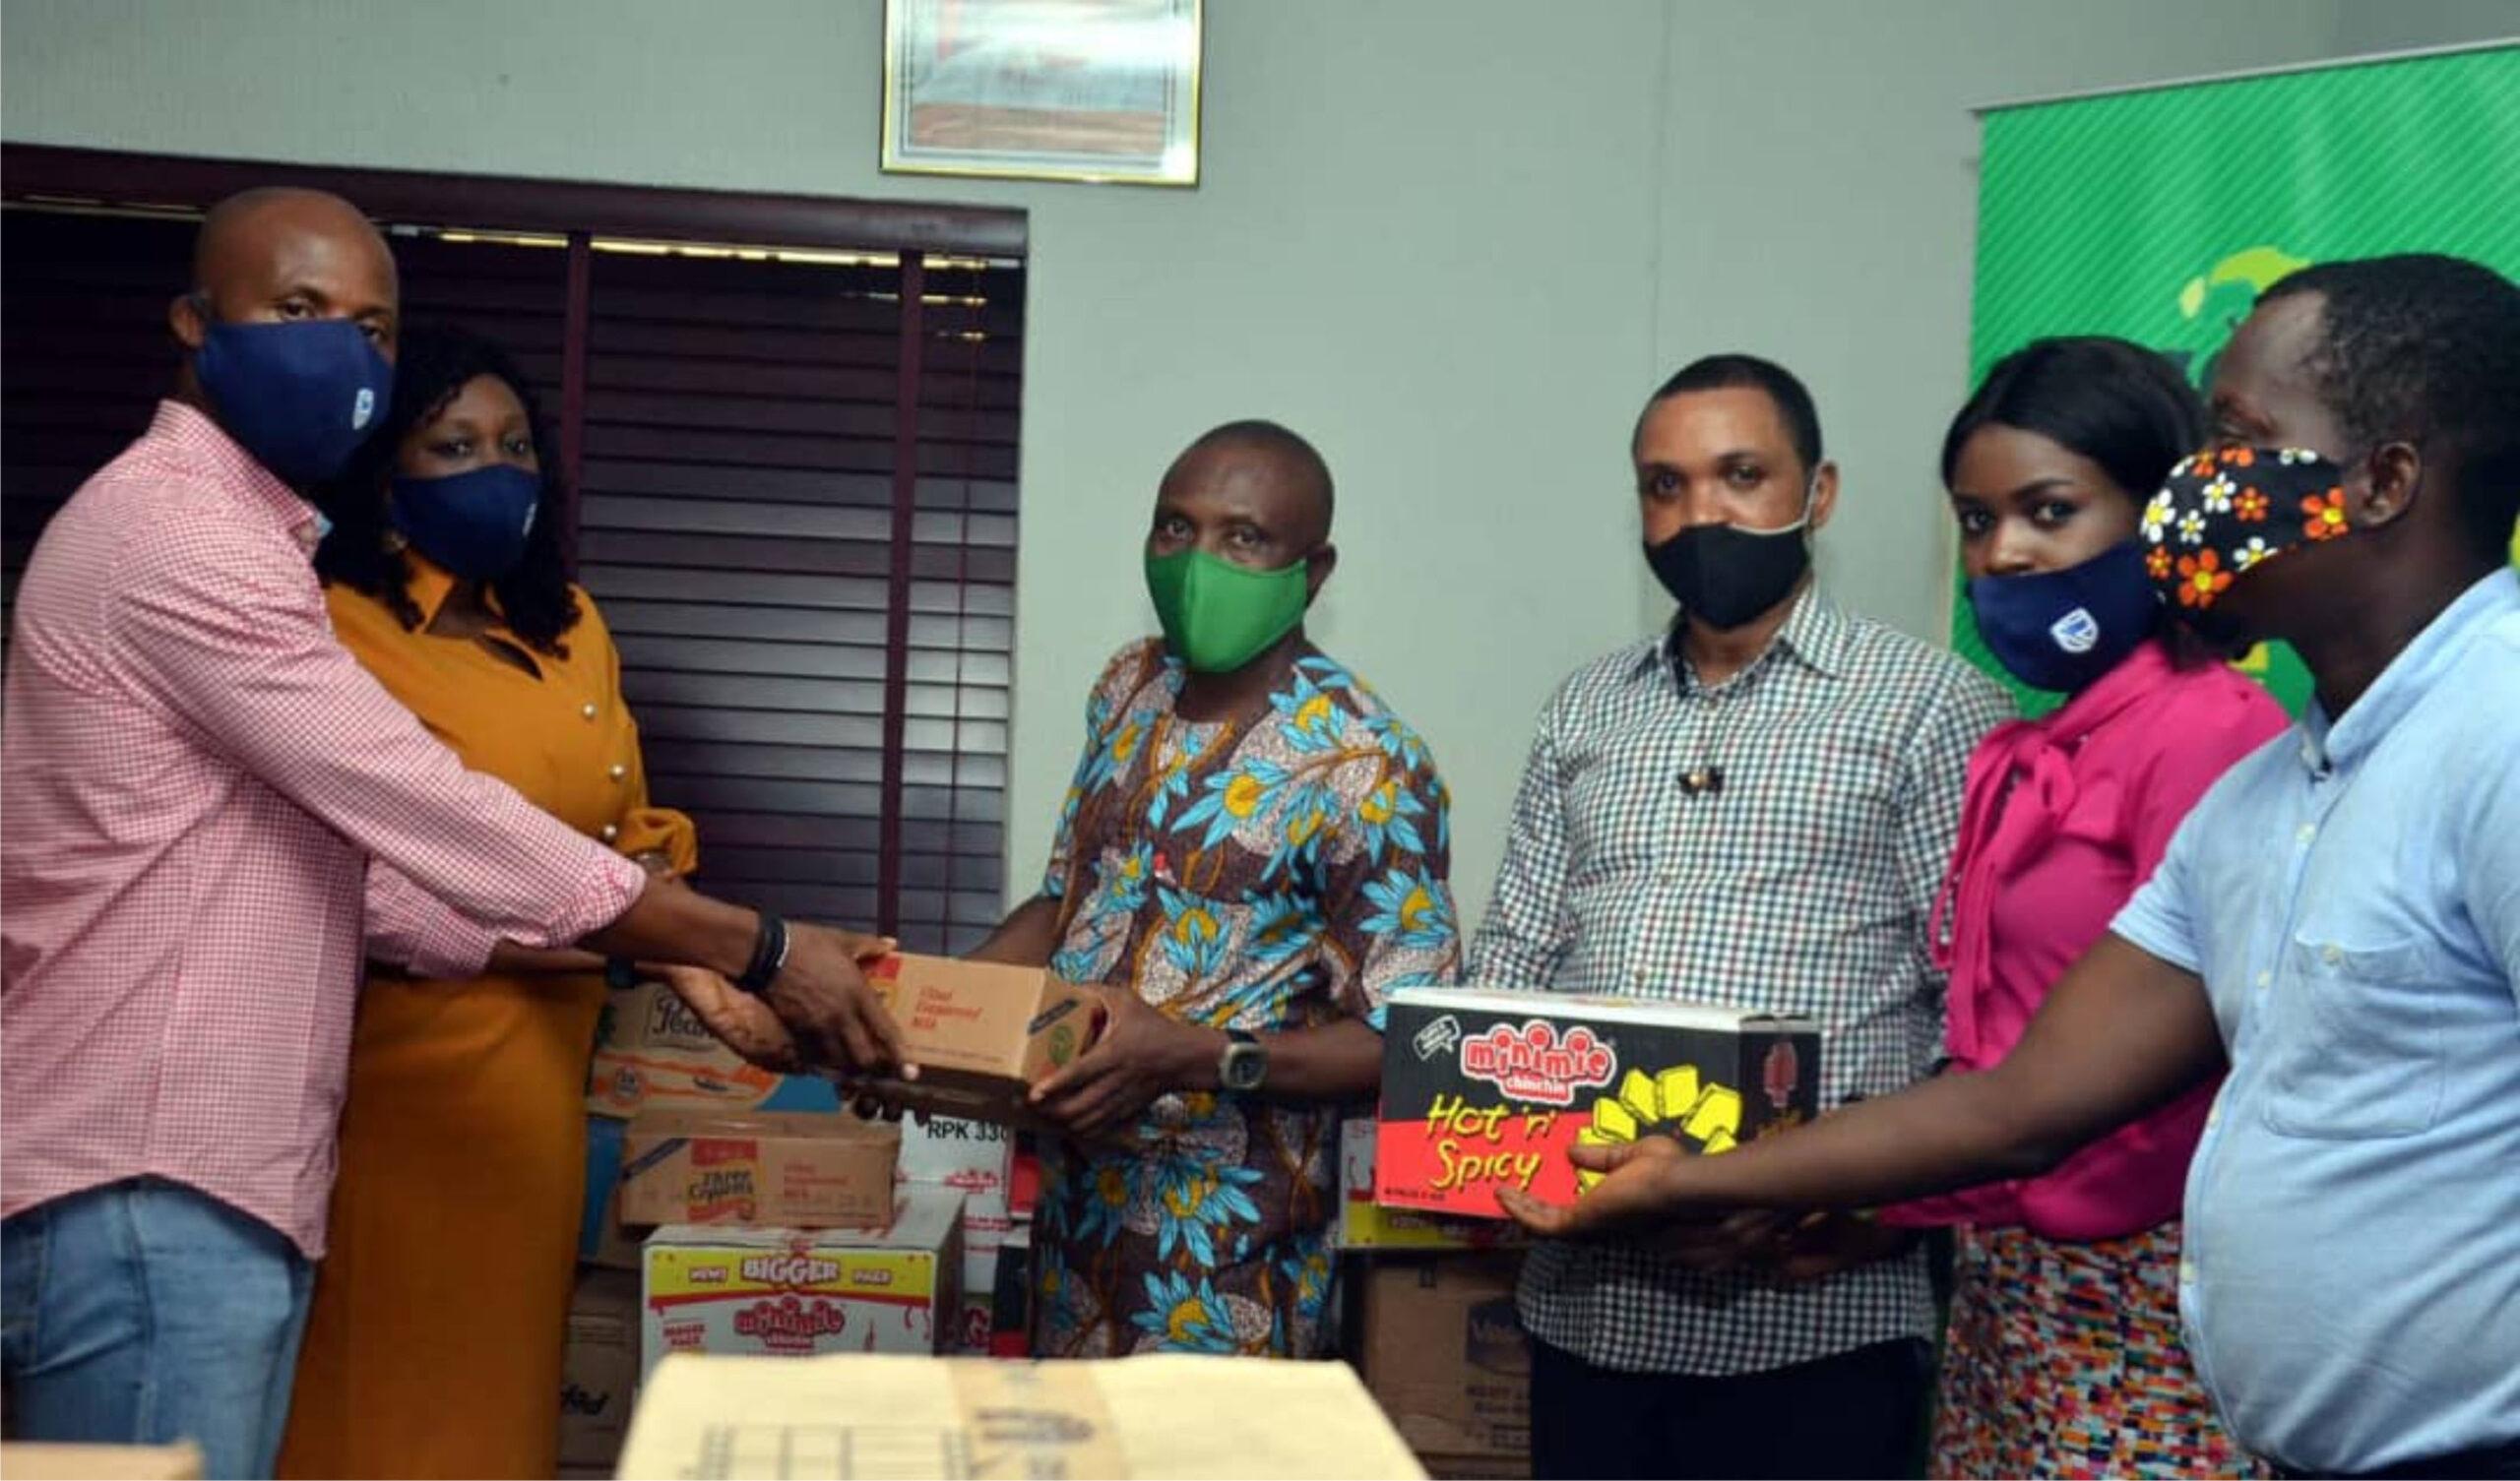 L-R: Mr. Obum Okoli, Treasurer, Advertisers Association of Nigeria (ADVAN), Ediri Ose-Ediale, Executive Secretary, ADVAN, Princewill Ekwujuru, Chairman, Brand Journalists Association of Nigeria (BJAN), Adeyemi Olufemi, Chief Information Officer, BJAN, Bukola Bankole, Publicity Secretary, ADVAN and Lukman Ishau, General Secretary, BJAN during Advertisers' Community Support Initiative organised by ADVAN to ease the effect of the COVID-19 pandemic in Lagos.